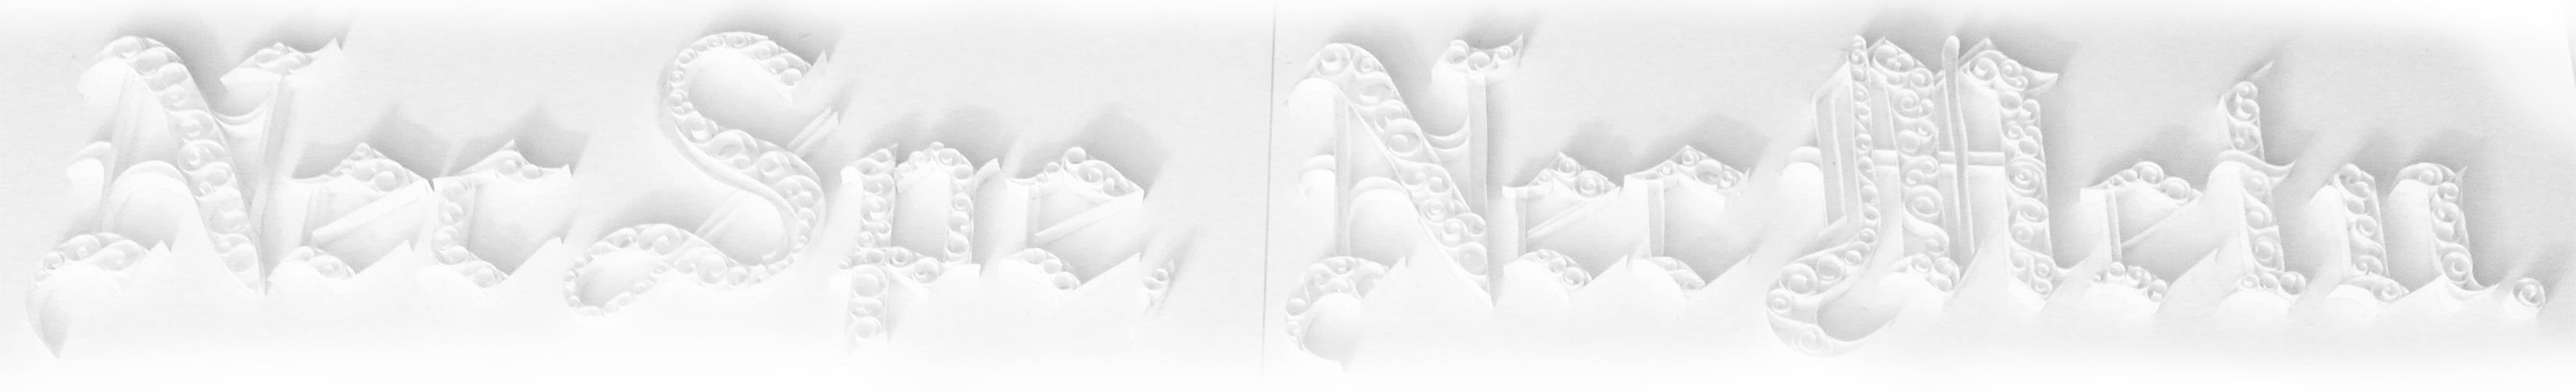 Katrina Castrillo Paper Type